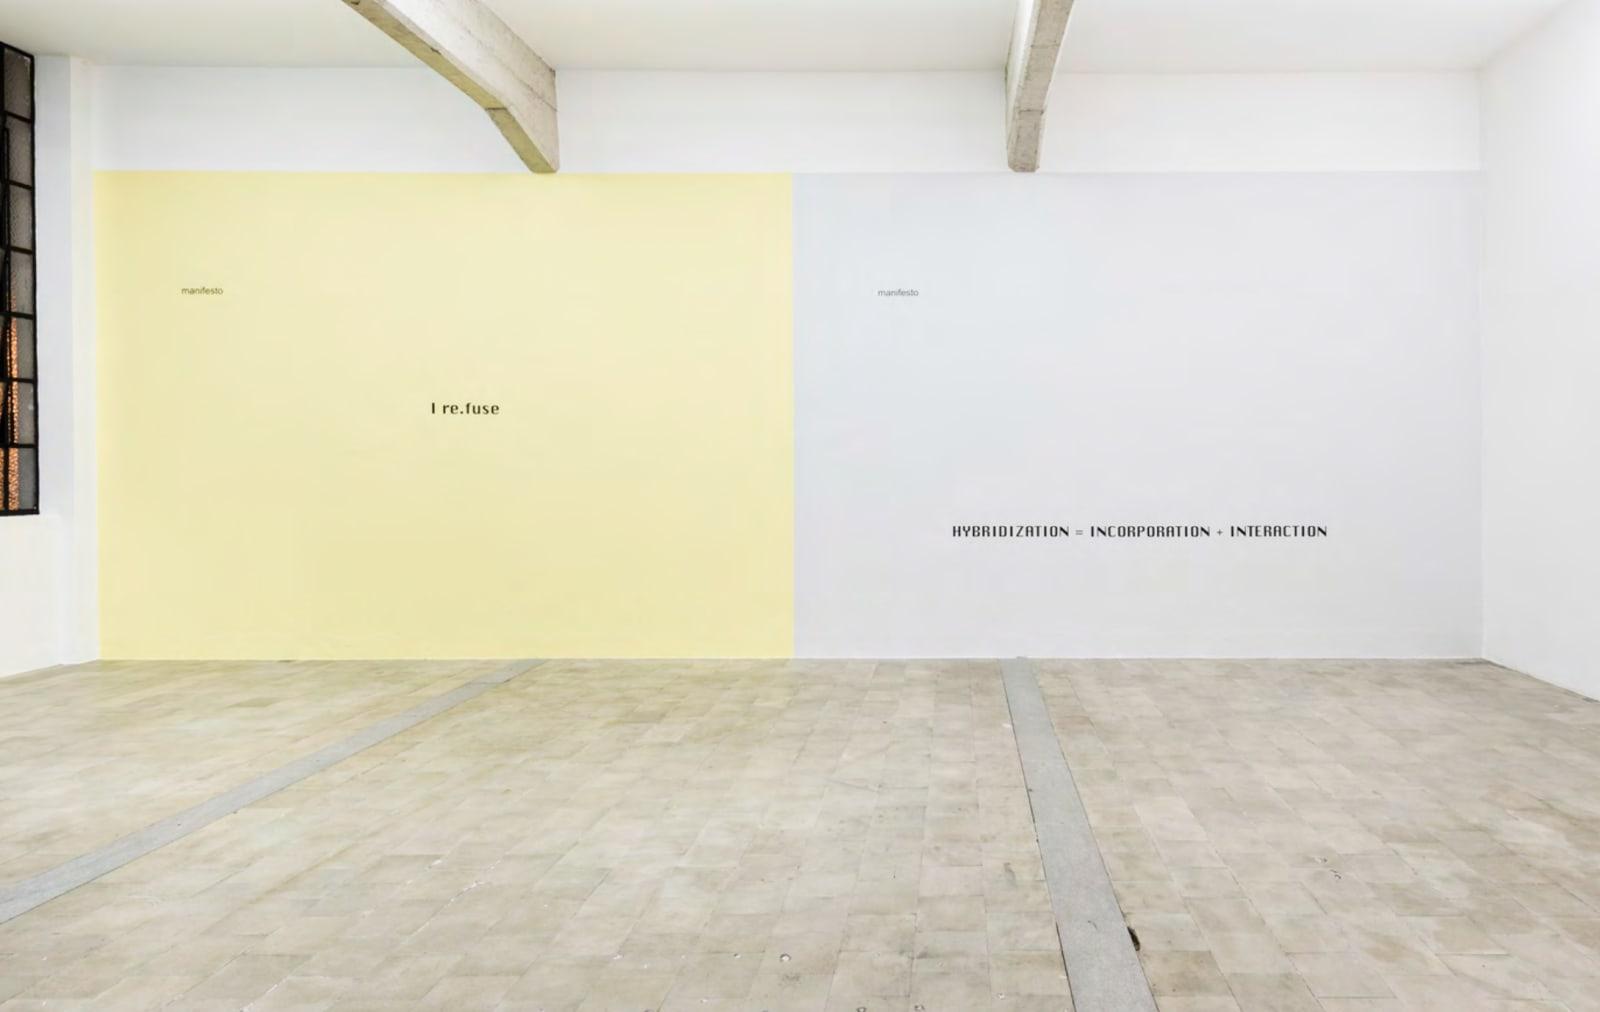 Ricardo Basbaum, 4 Manifests, 1996 On view at Galeria Jaqueline Martins, São Paulo, 2017